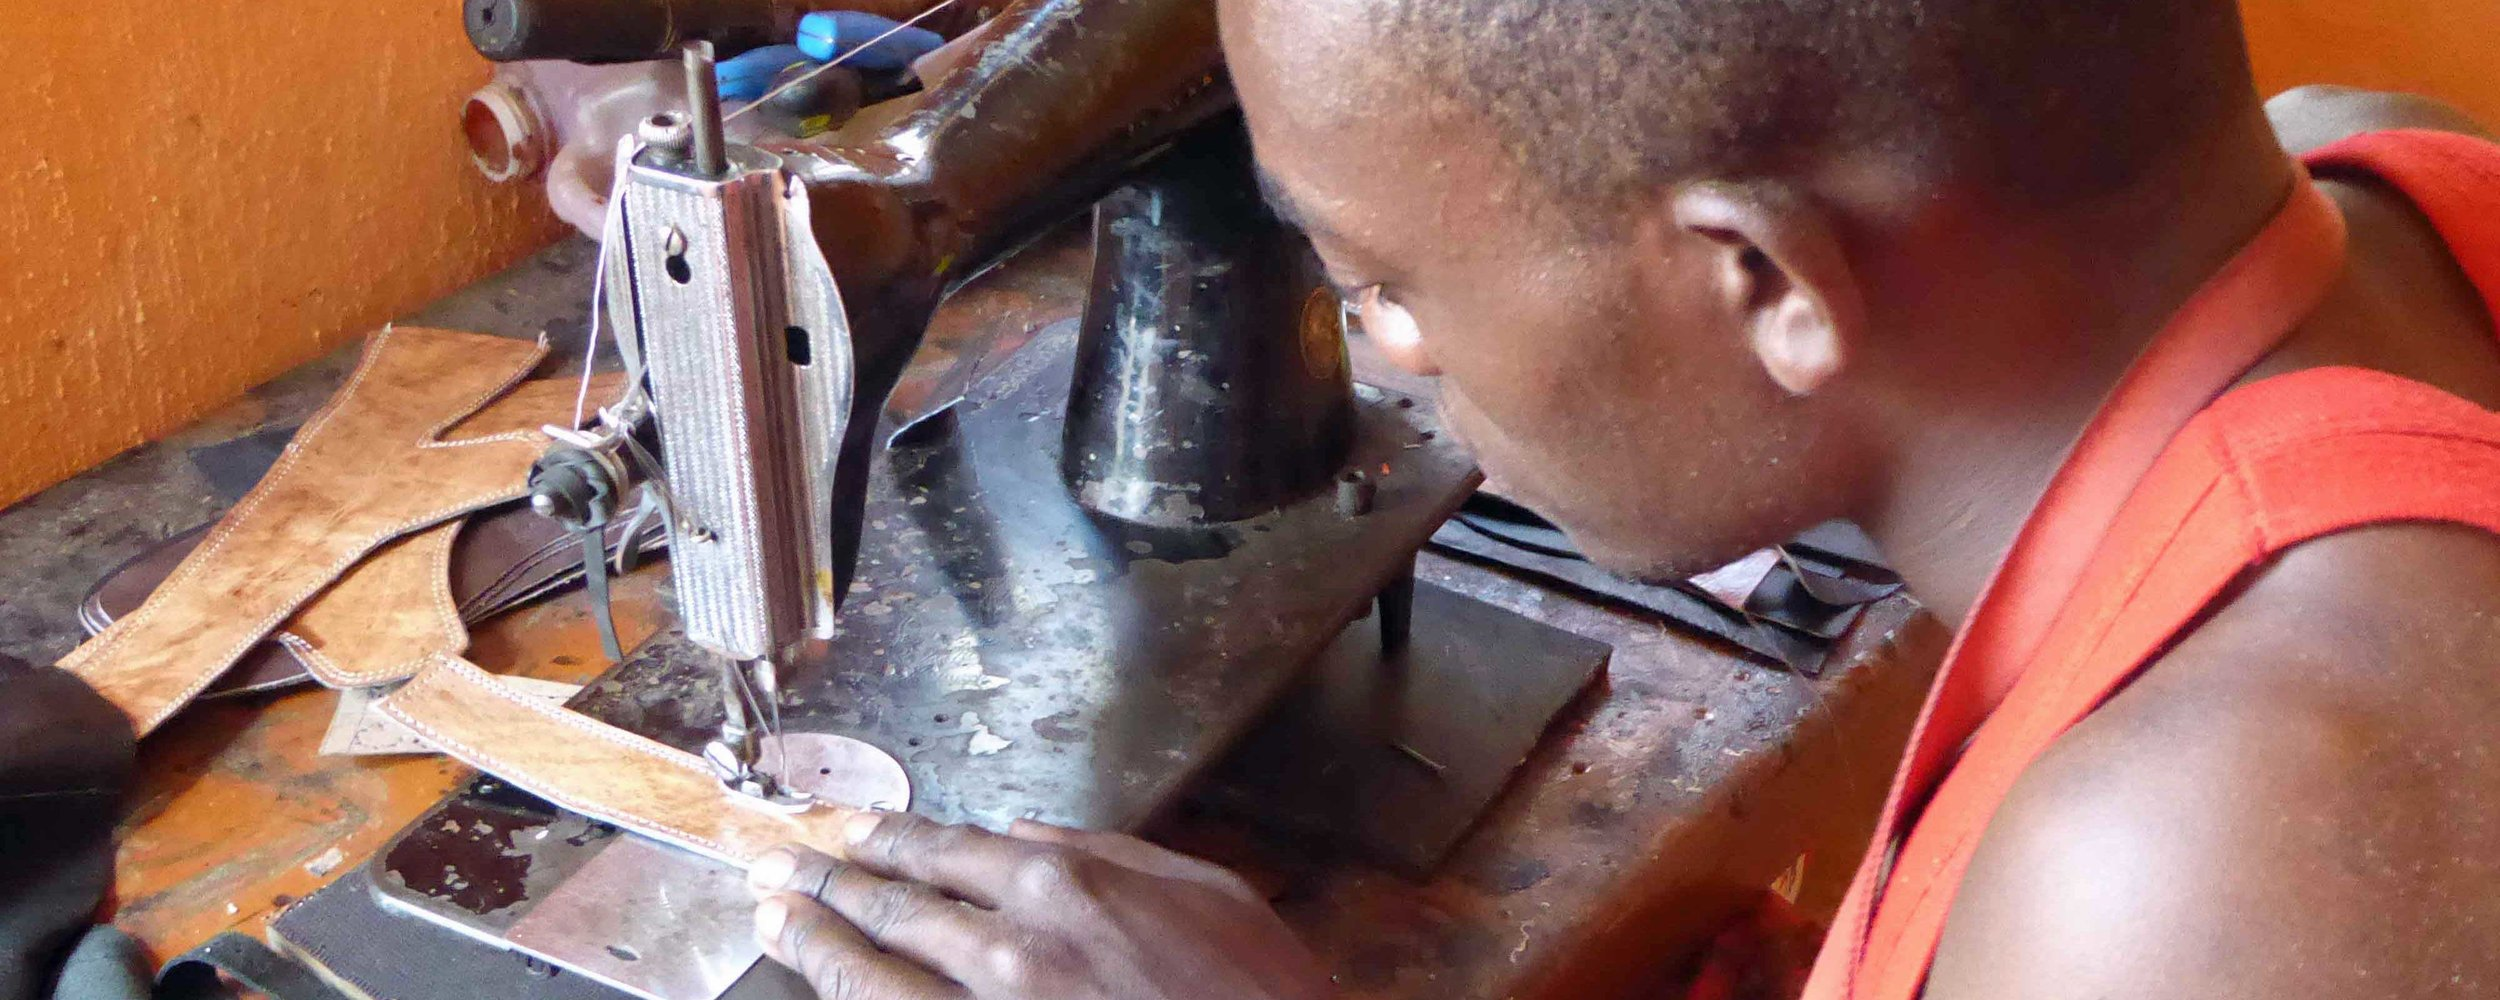 15x6-Kivu-Leather-header.jpg